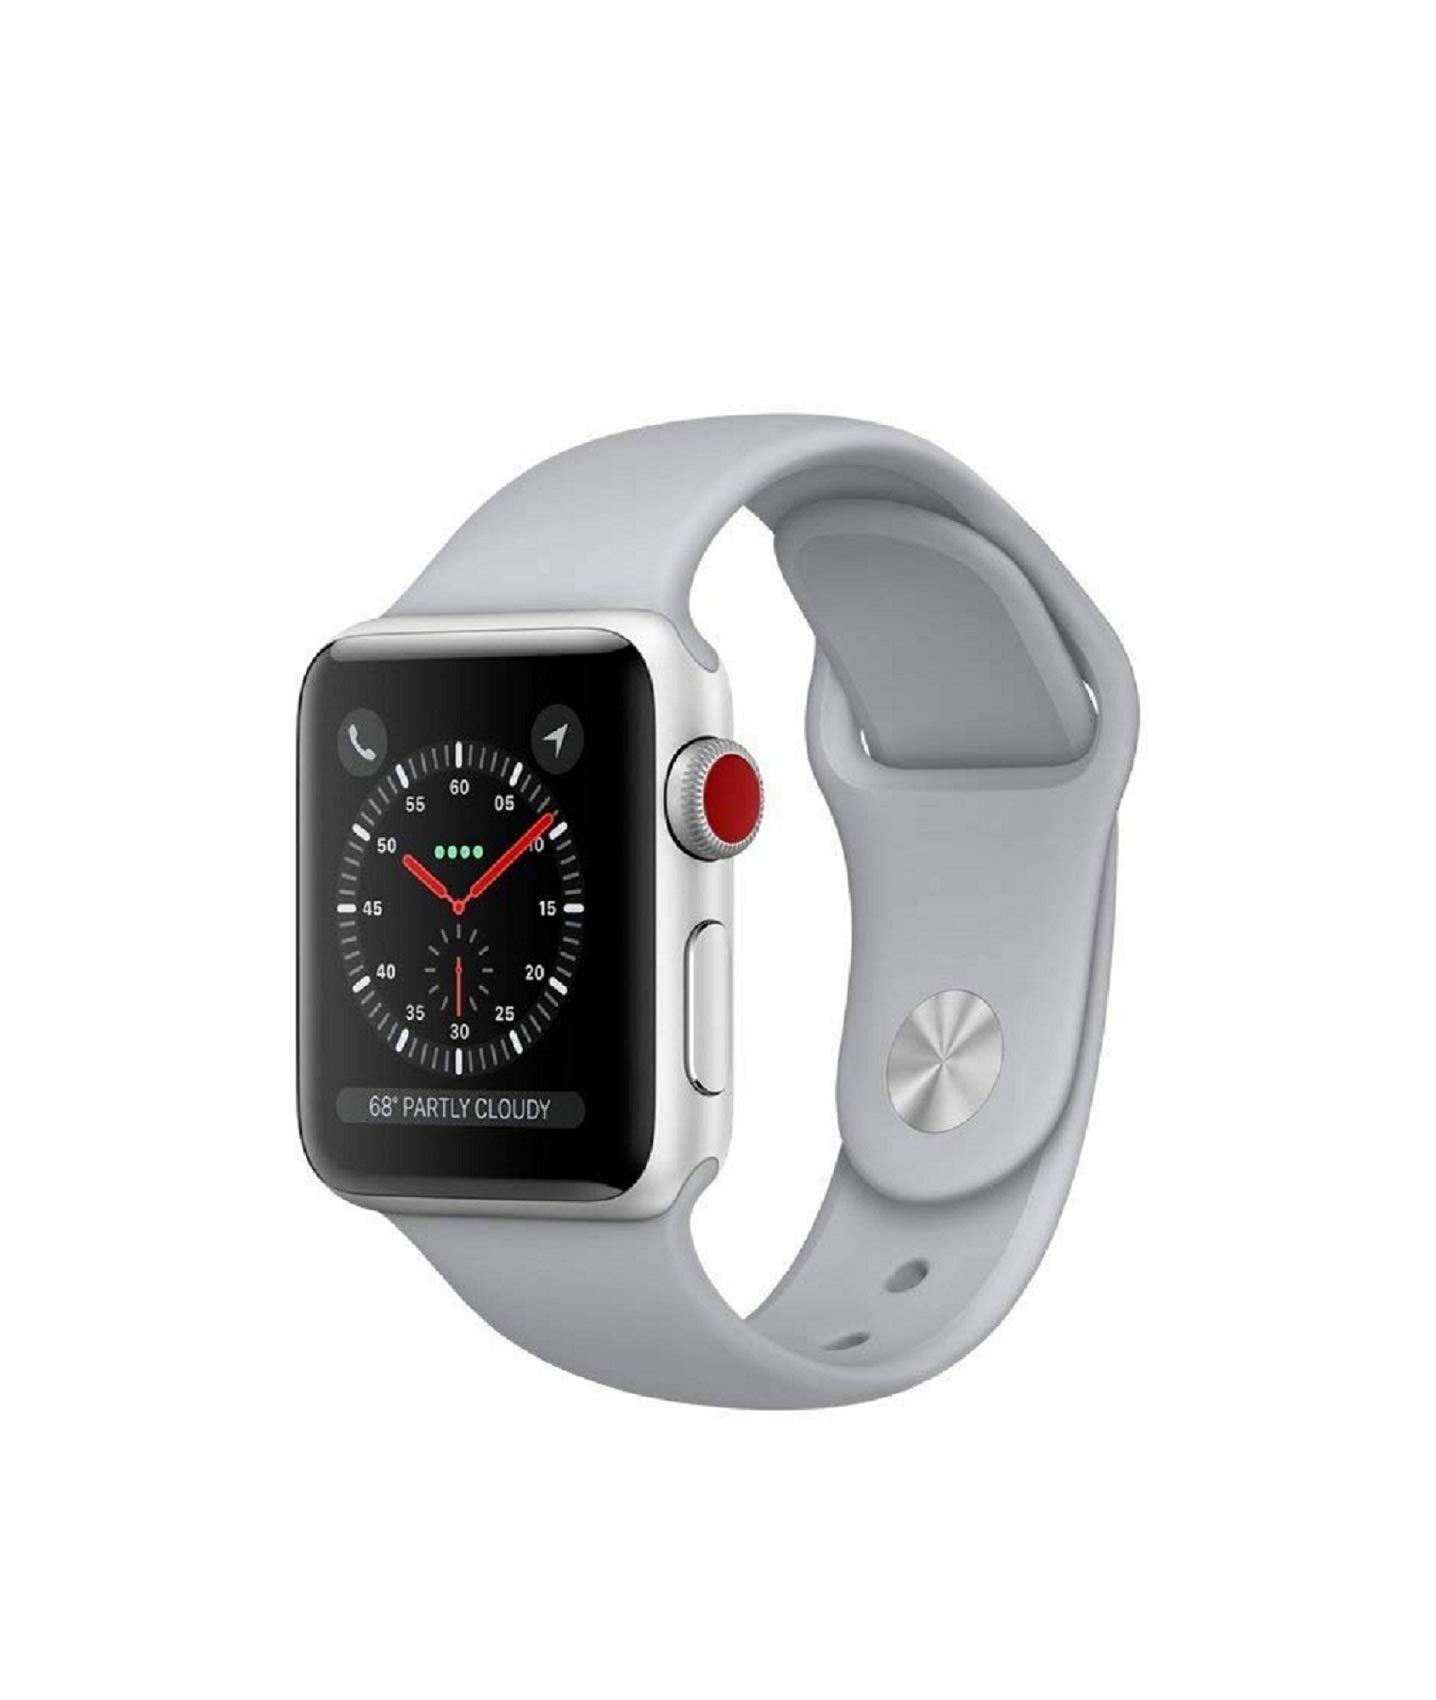 Apple watch series 3 Aluminum case Sport 38mm GPS + Cellular GSM unlocked (Silver Al case w/ Fog Sport band)